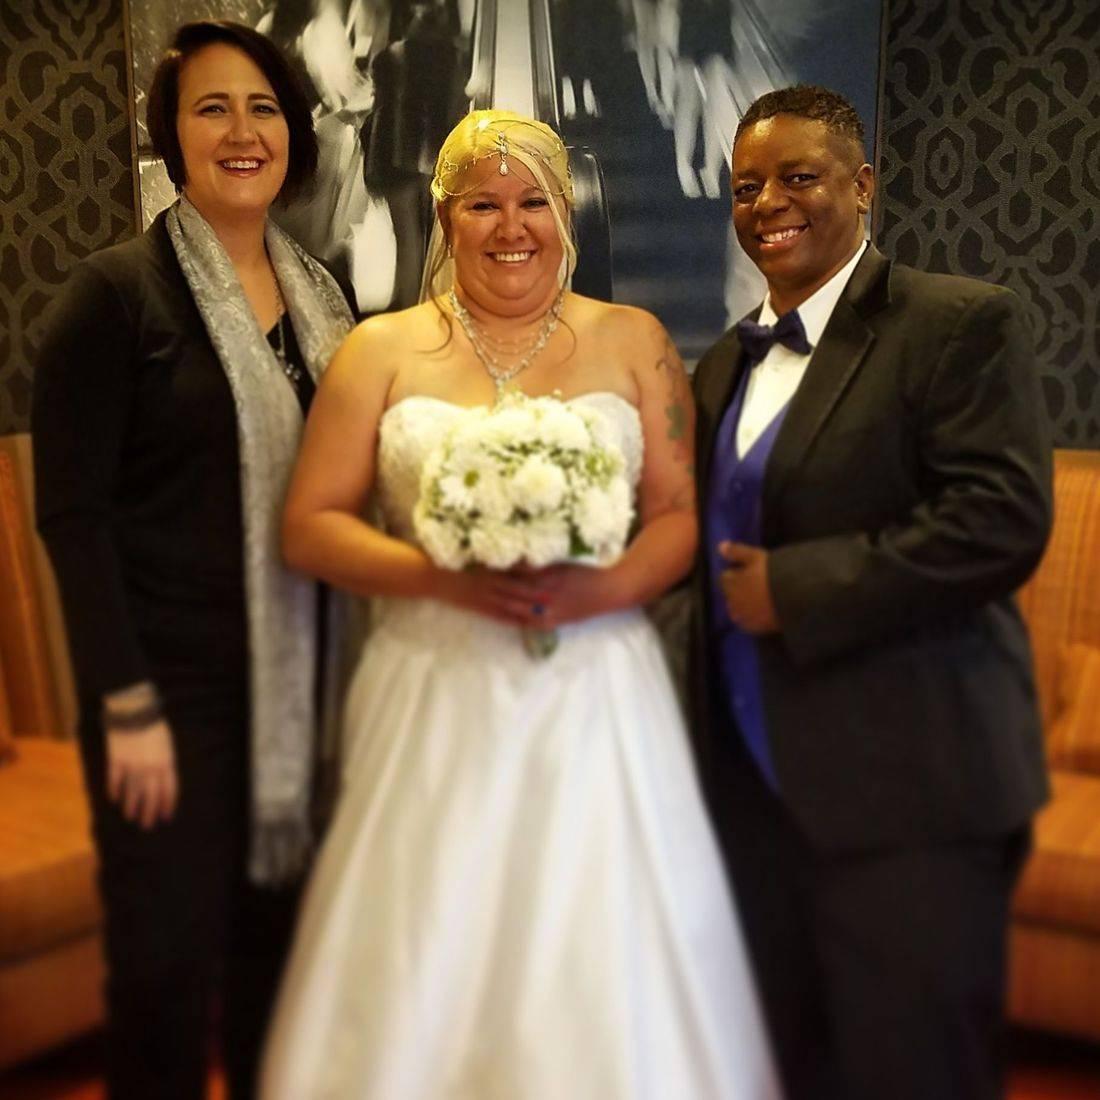 lesbian, gay, same sex wedding, lgbtq, minister, officiant, celebrant, wedding